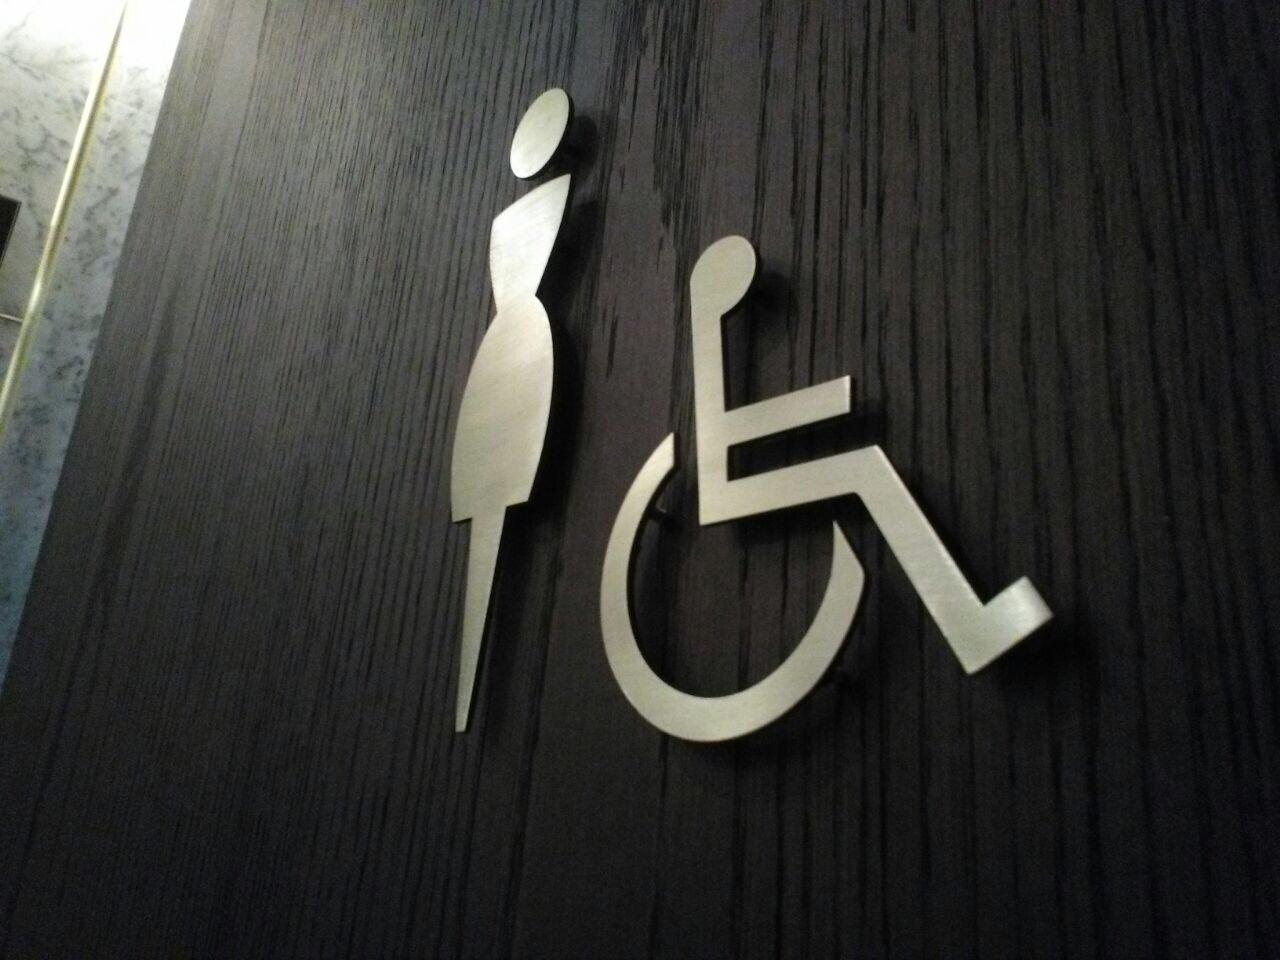 Zeminsiz wc pictogram